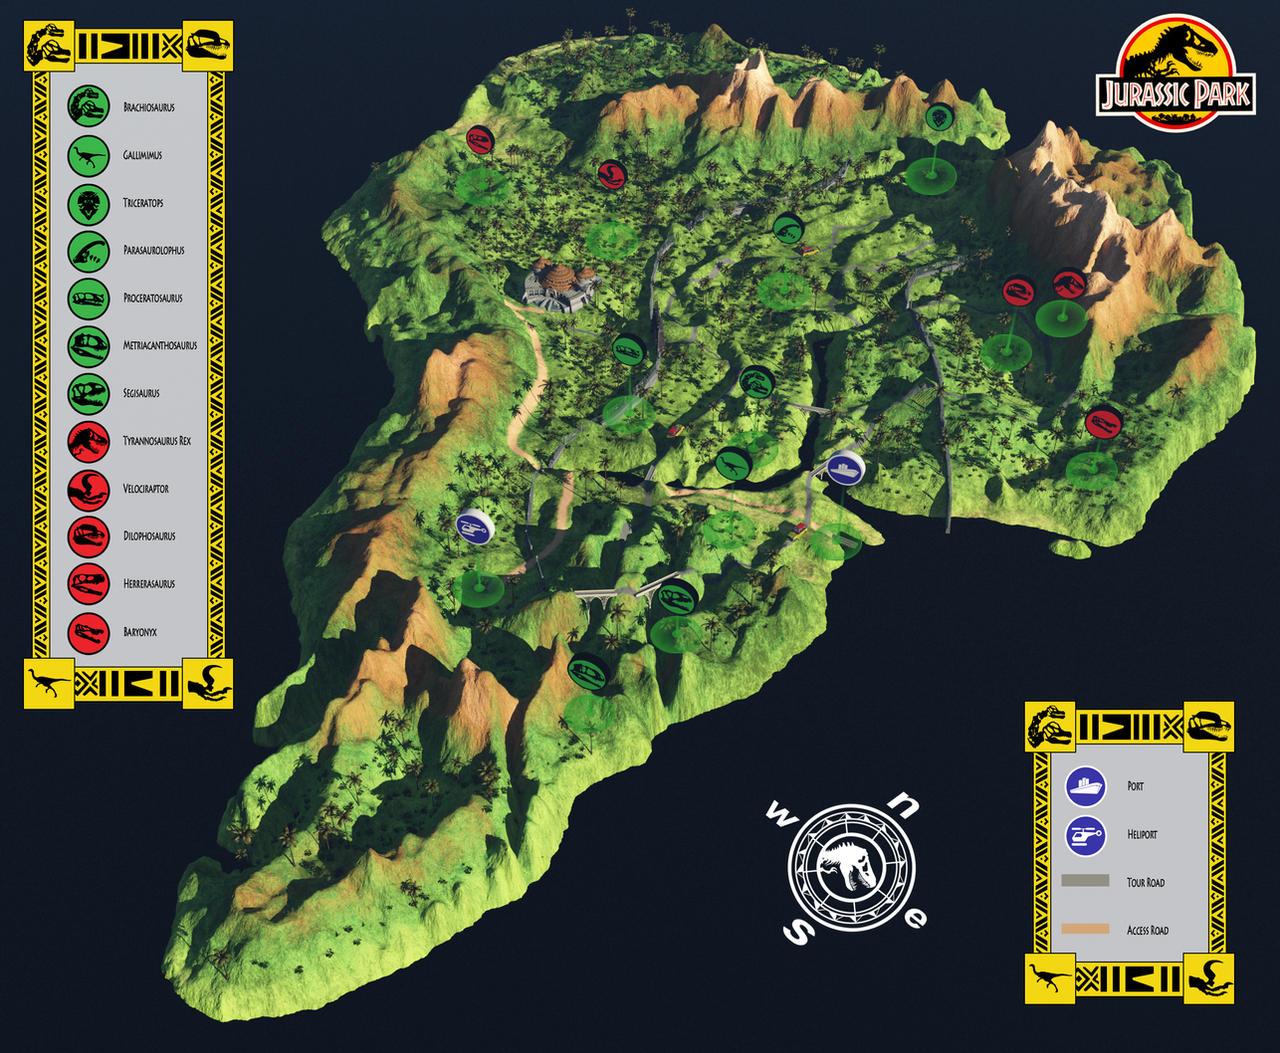 Jurassic park card 3 by chicagocubsfan24 on deviantart - Jurassic Park Map By Chakotay02